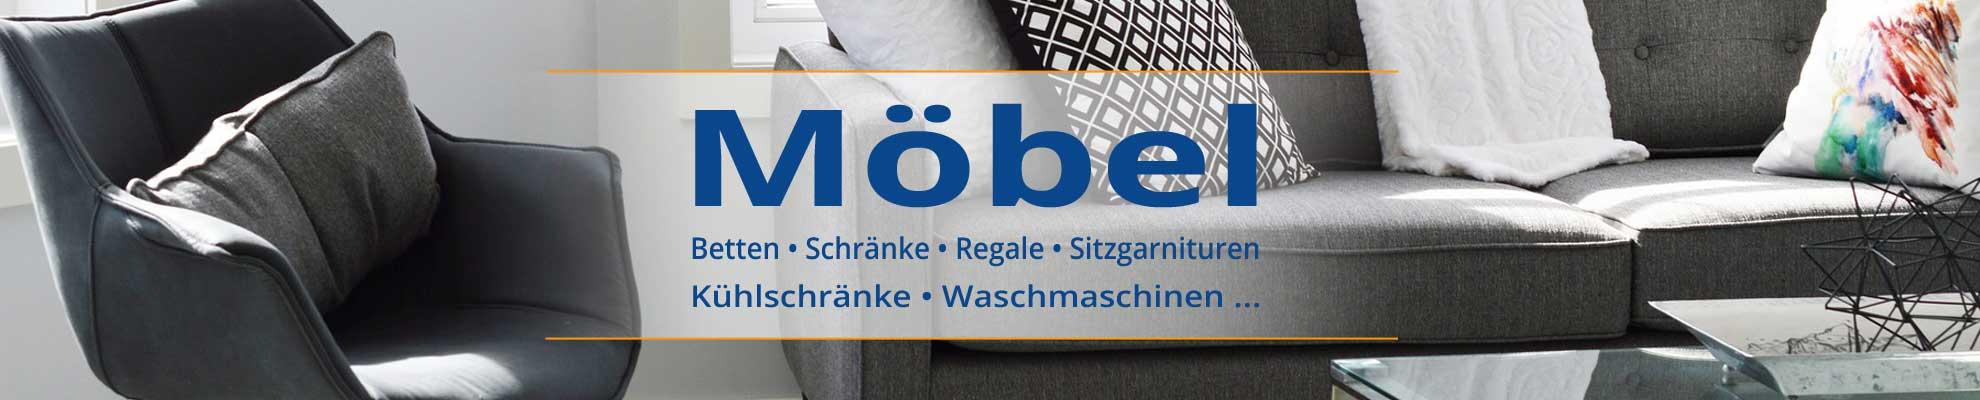 Magazin Halsenbach - gut erhaltene Möbel